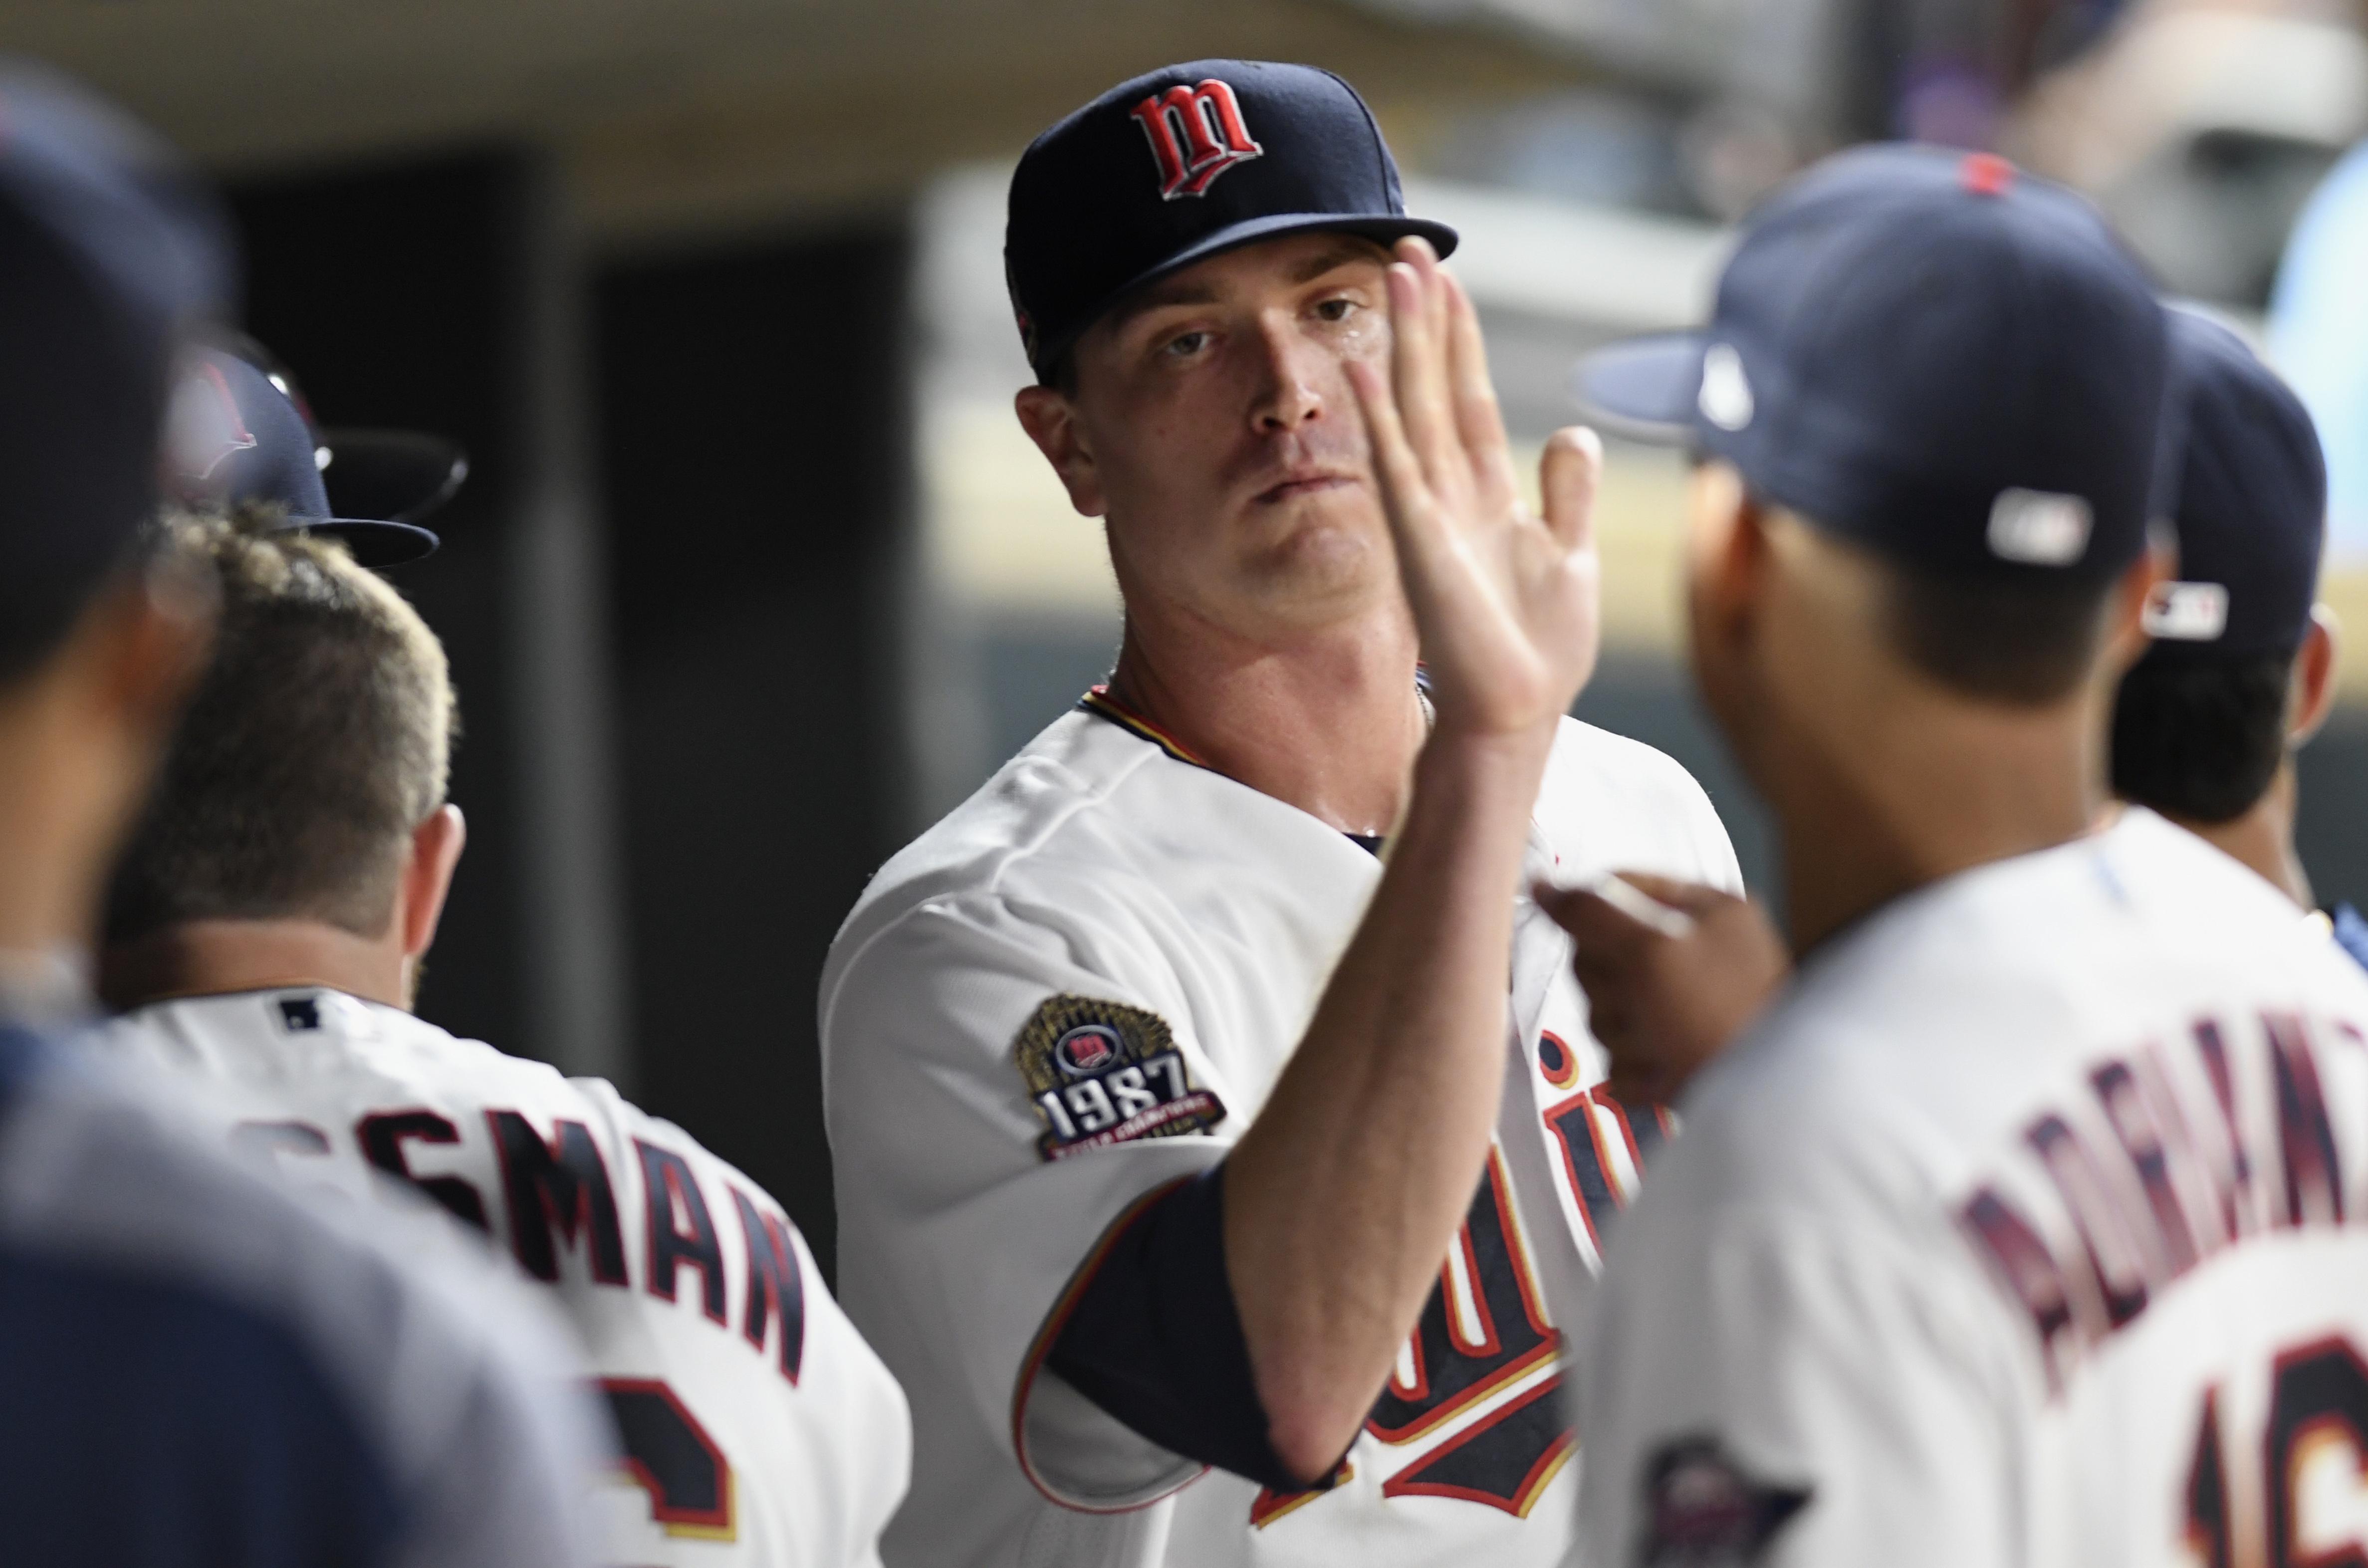 Tigers_twins_baseball_31700